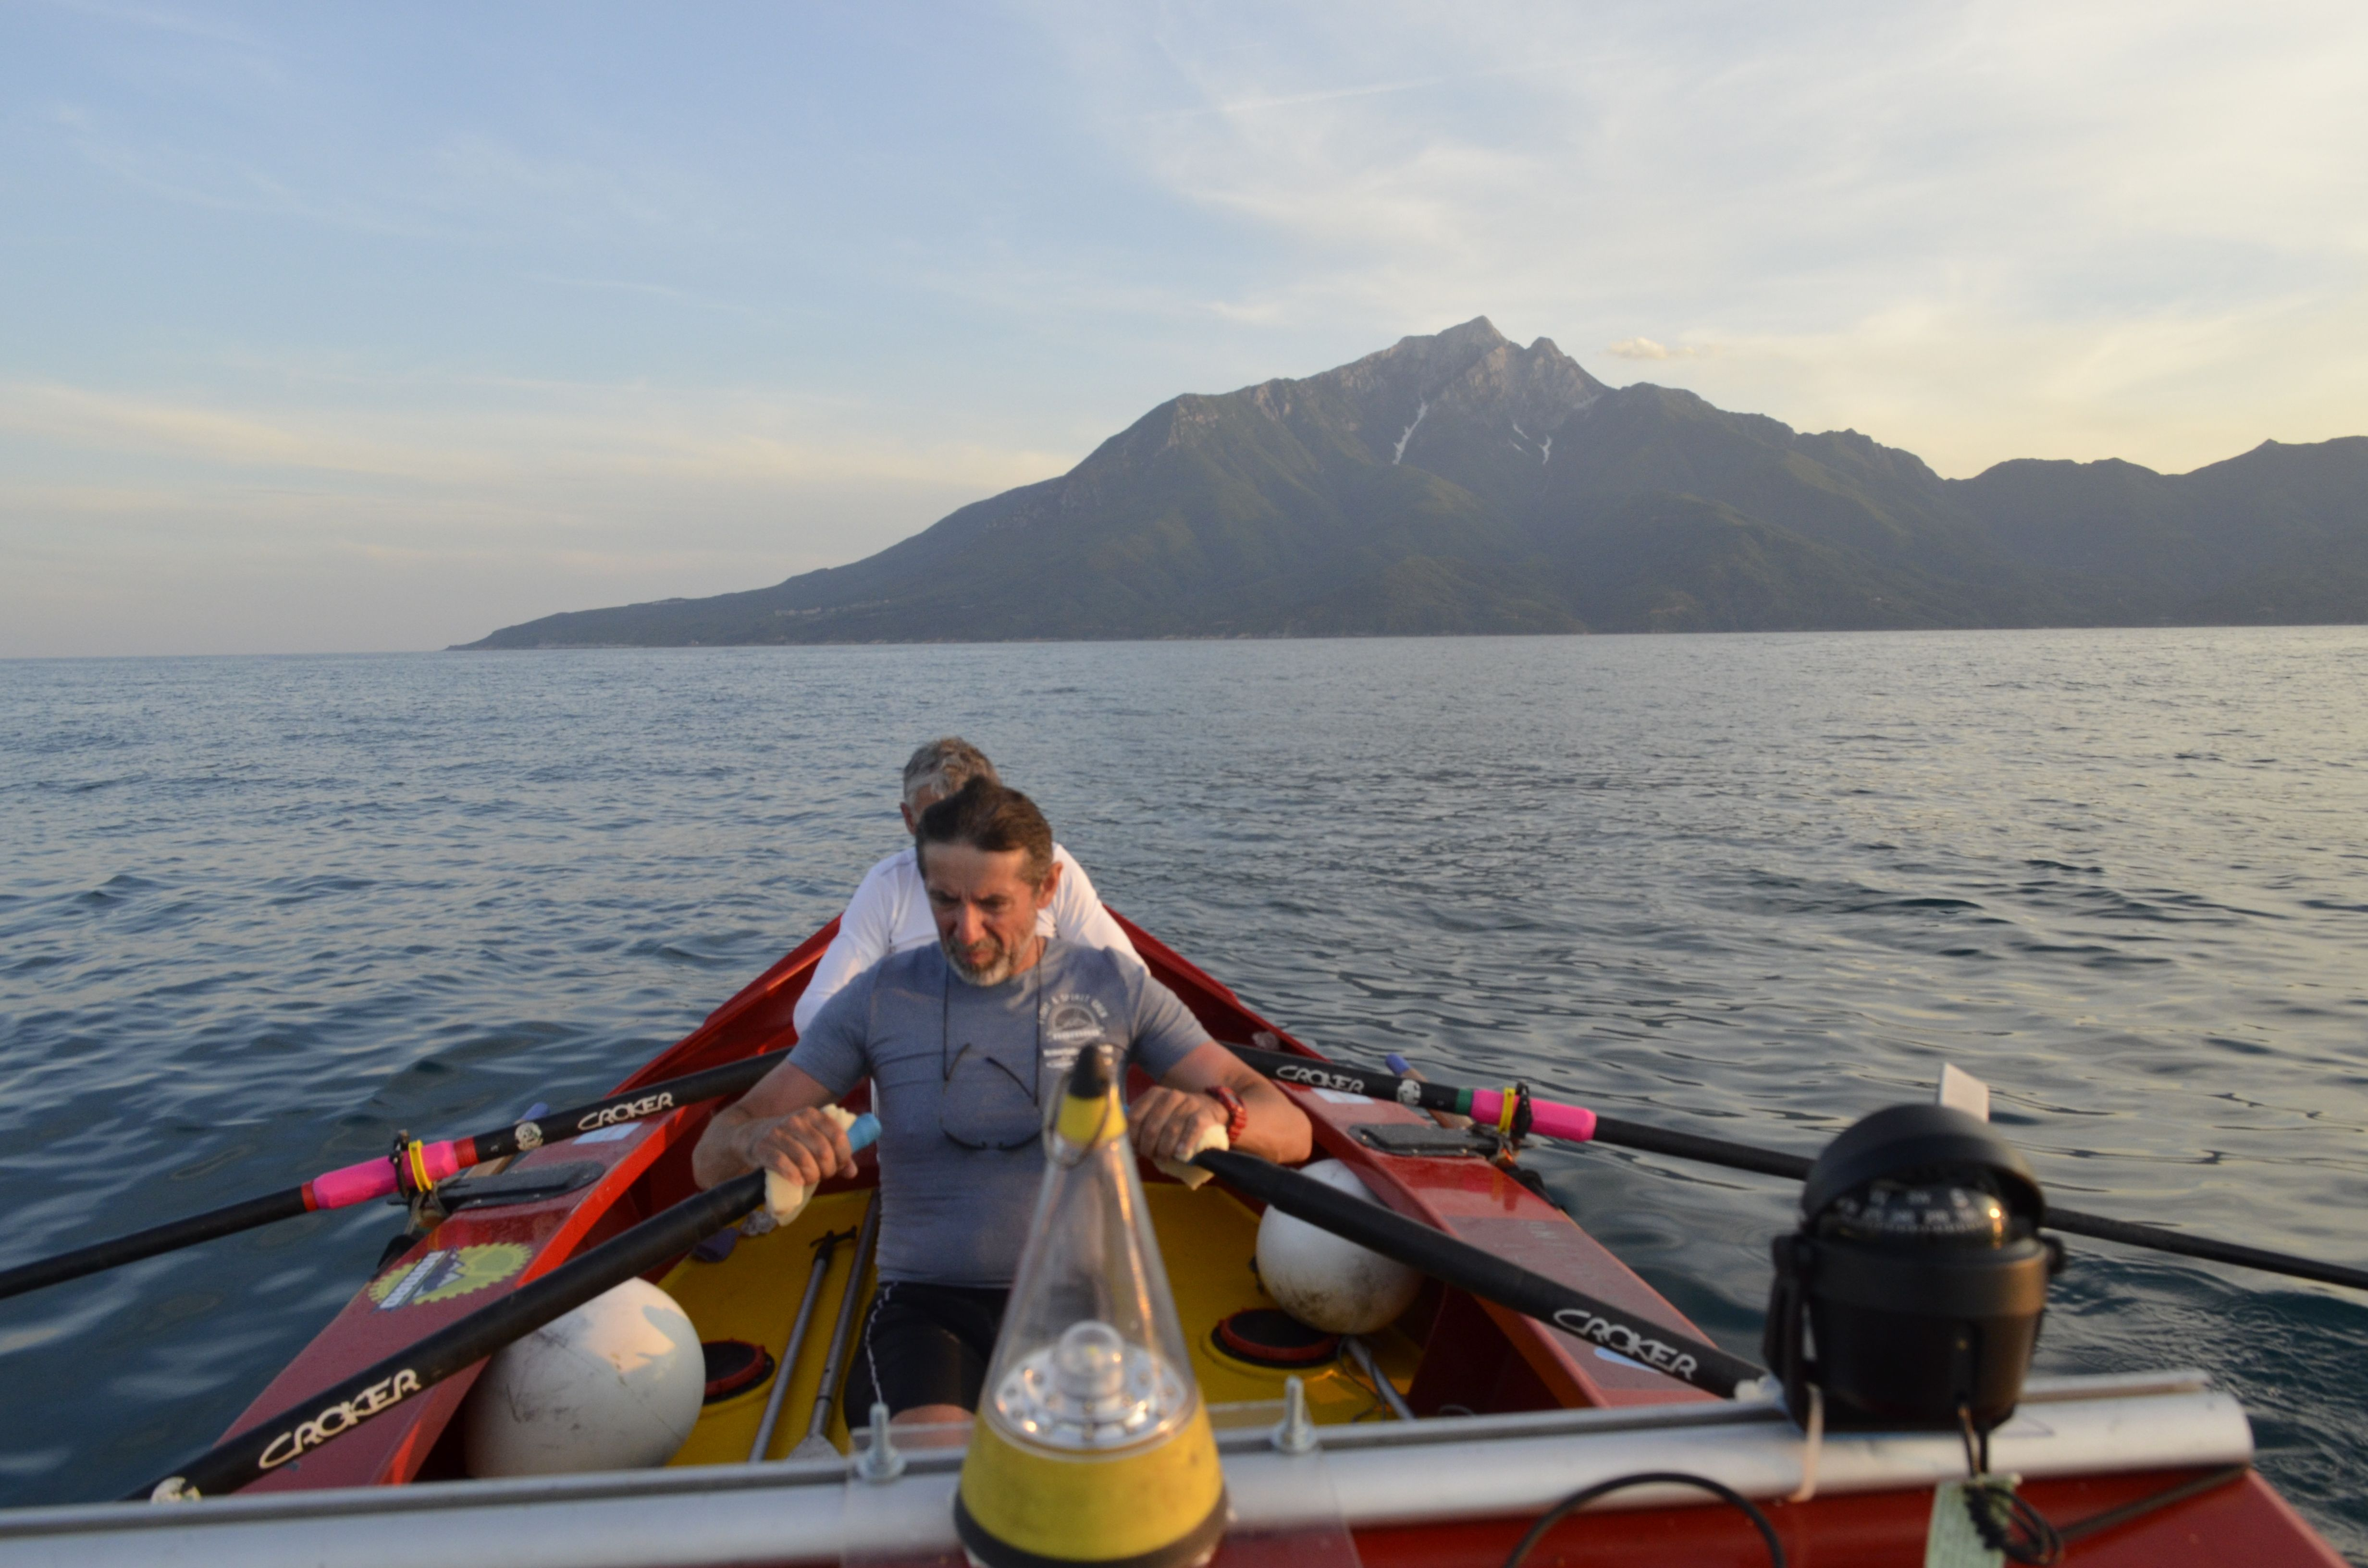 Nomads rowing beneath Holy Mountain Athos, Greece